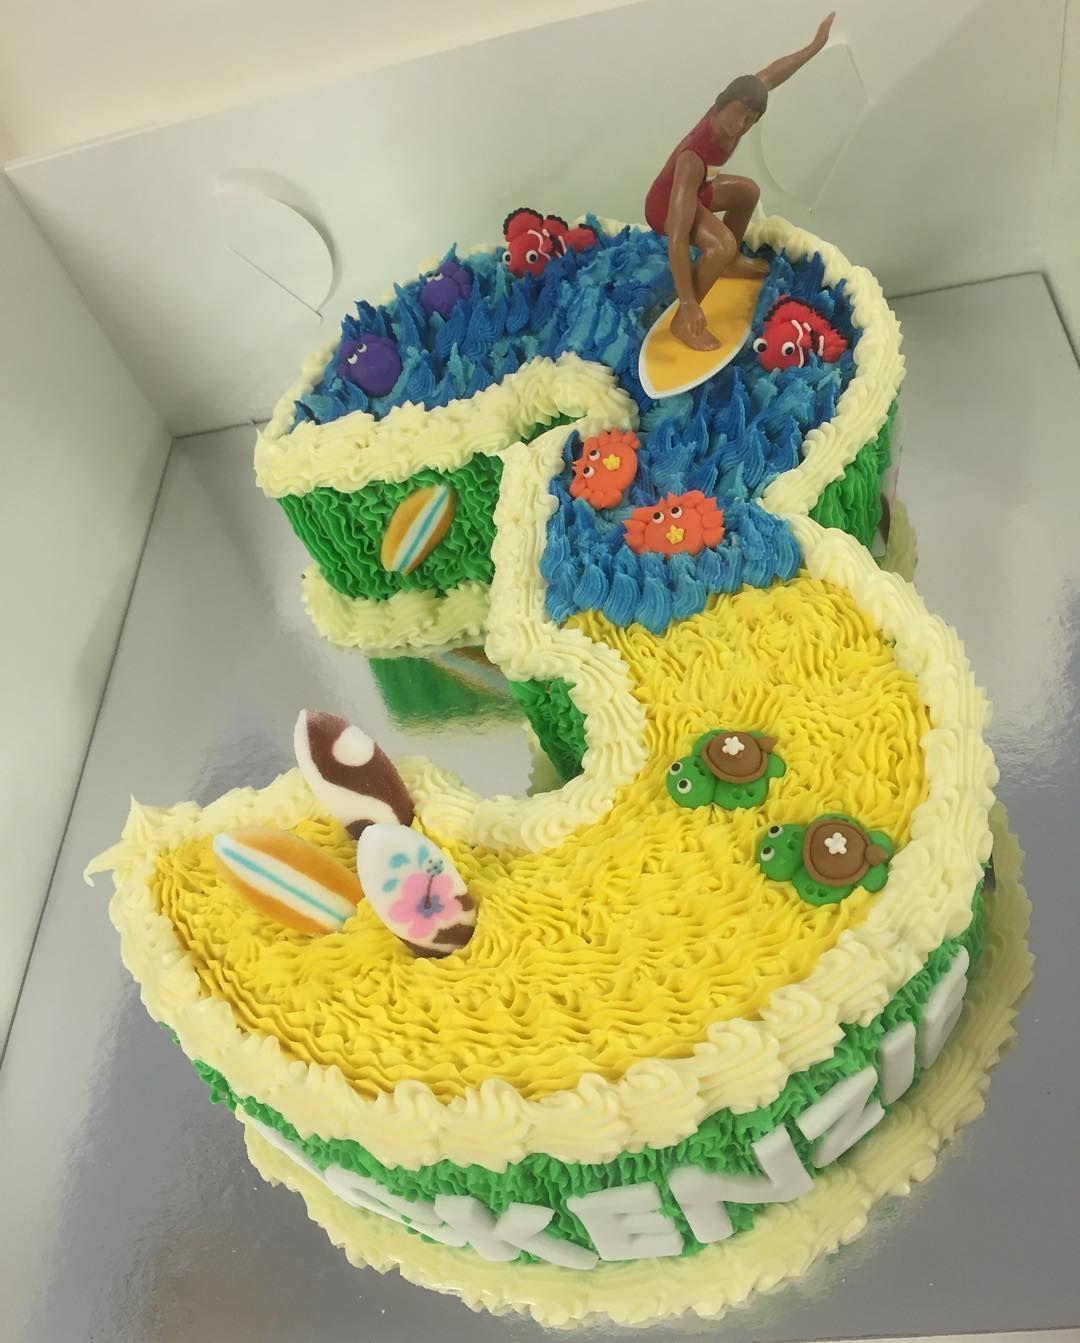 Number 3 Surfing #cake #cakes#cakeporn #cakedesign #cakedecorator #cakedecorating #buttercream #buttercreamcakes #kids #kidscakes #kidsparties #partyplanners #partyplanning #childrenscakes #eventstylist #events #eventmanagement #foodporn #foodblogger #delicious#chocolatecake#birthdaycakes #surfing#surf#beach by temptation_bites